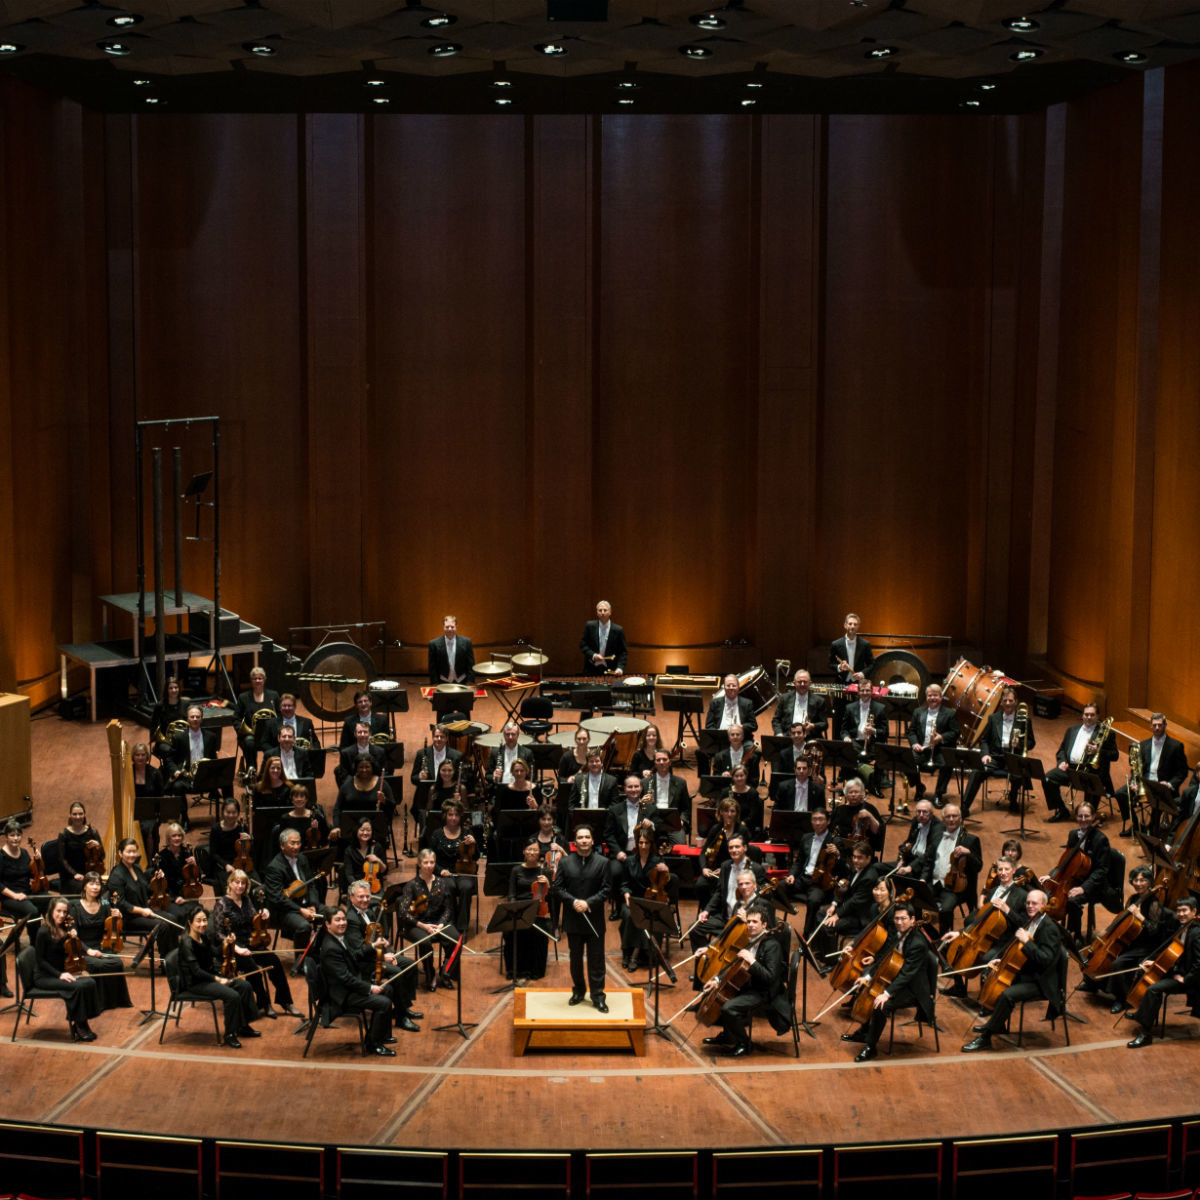 Houston Symphony with conductor Andres Orozco-Estrada